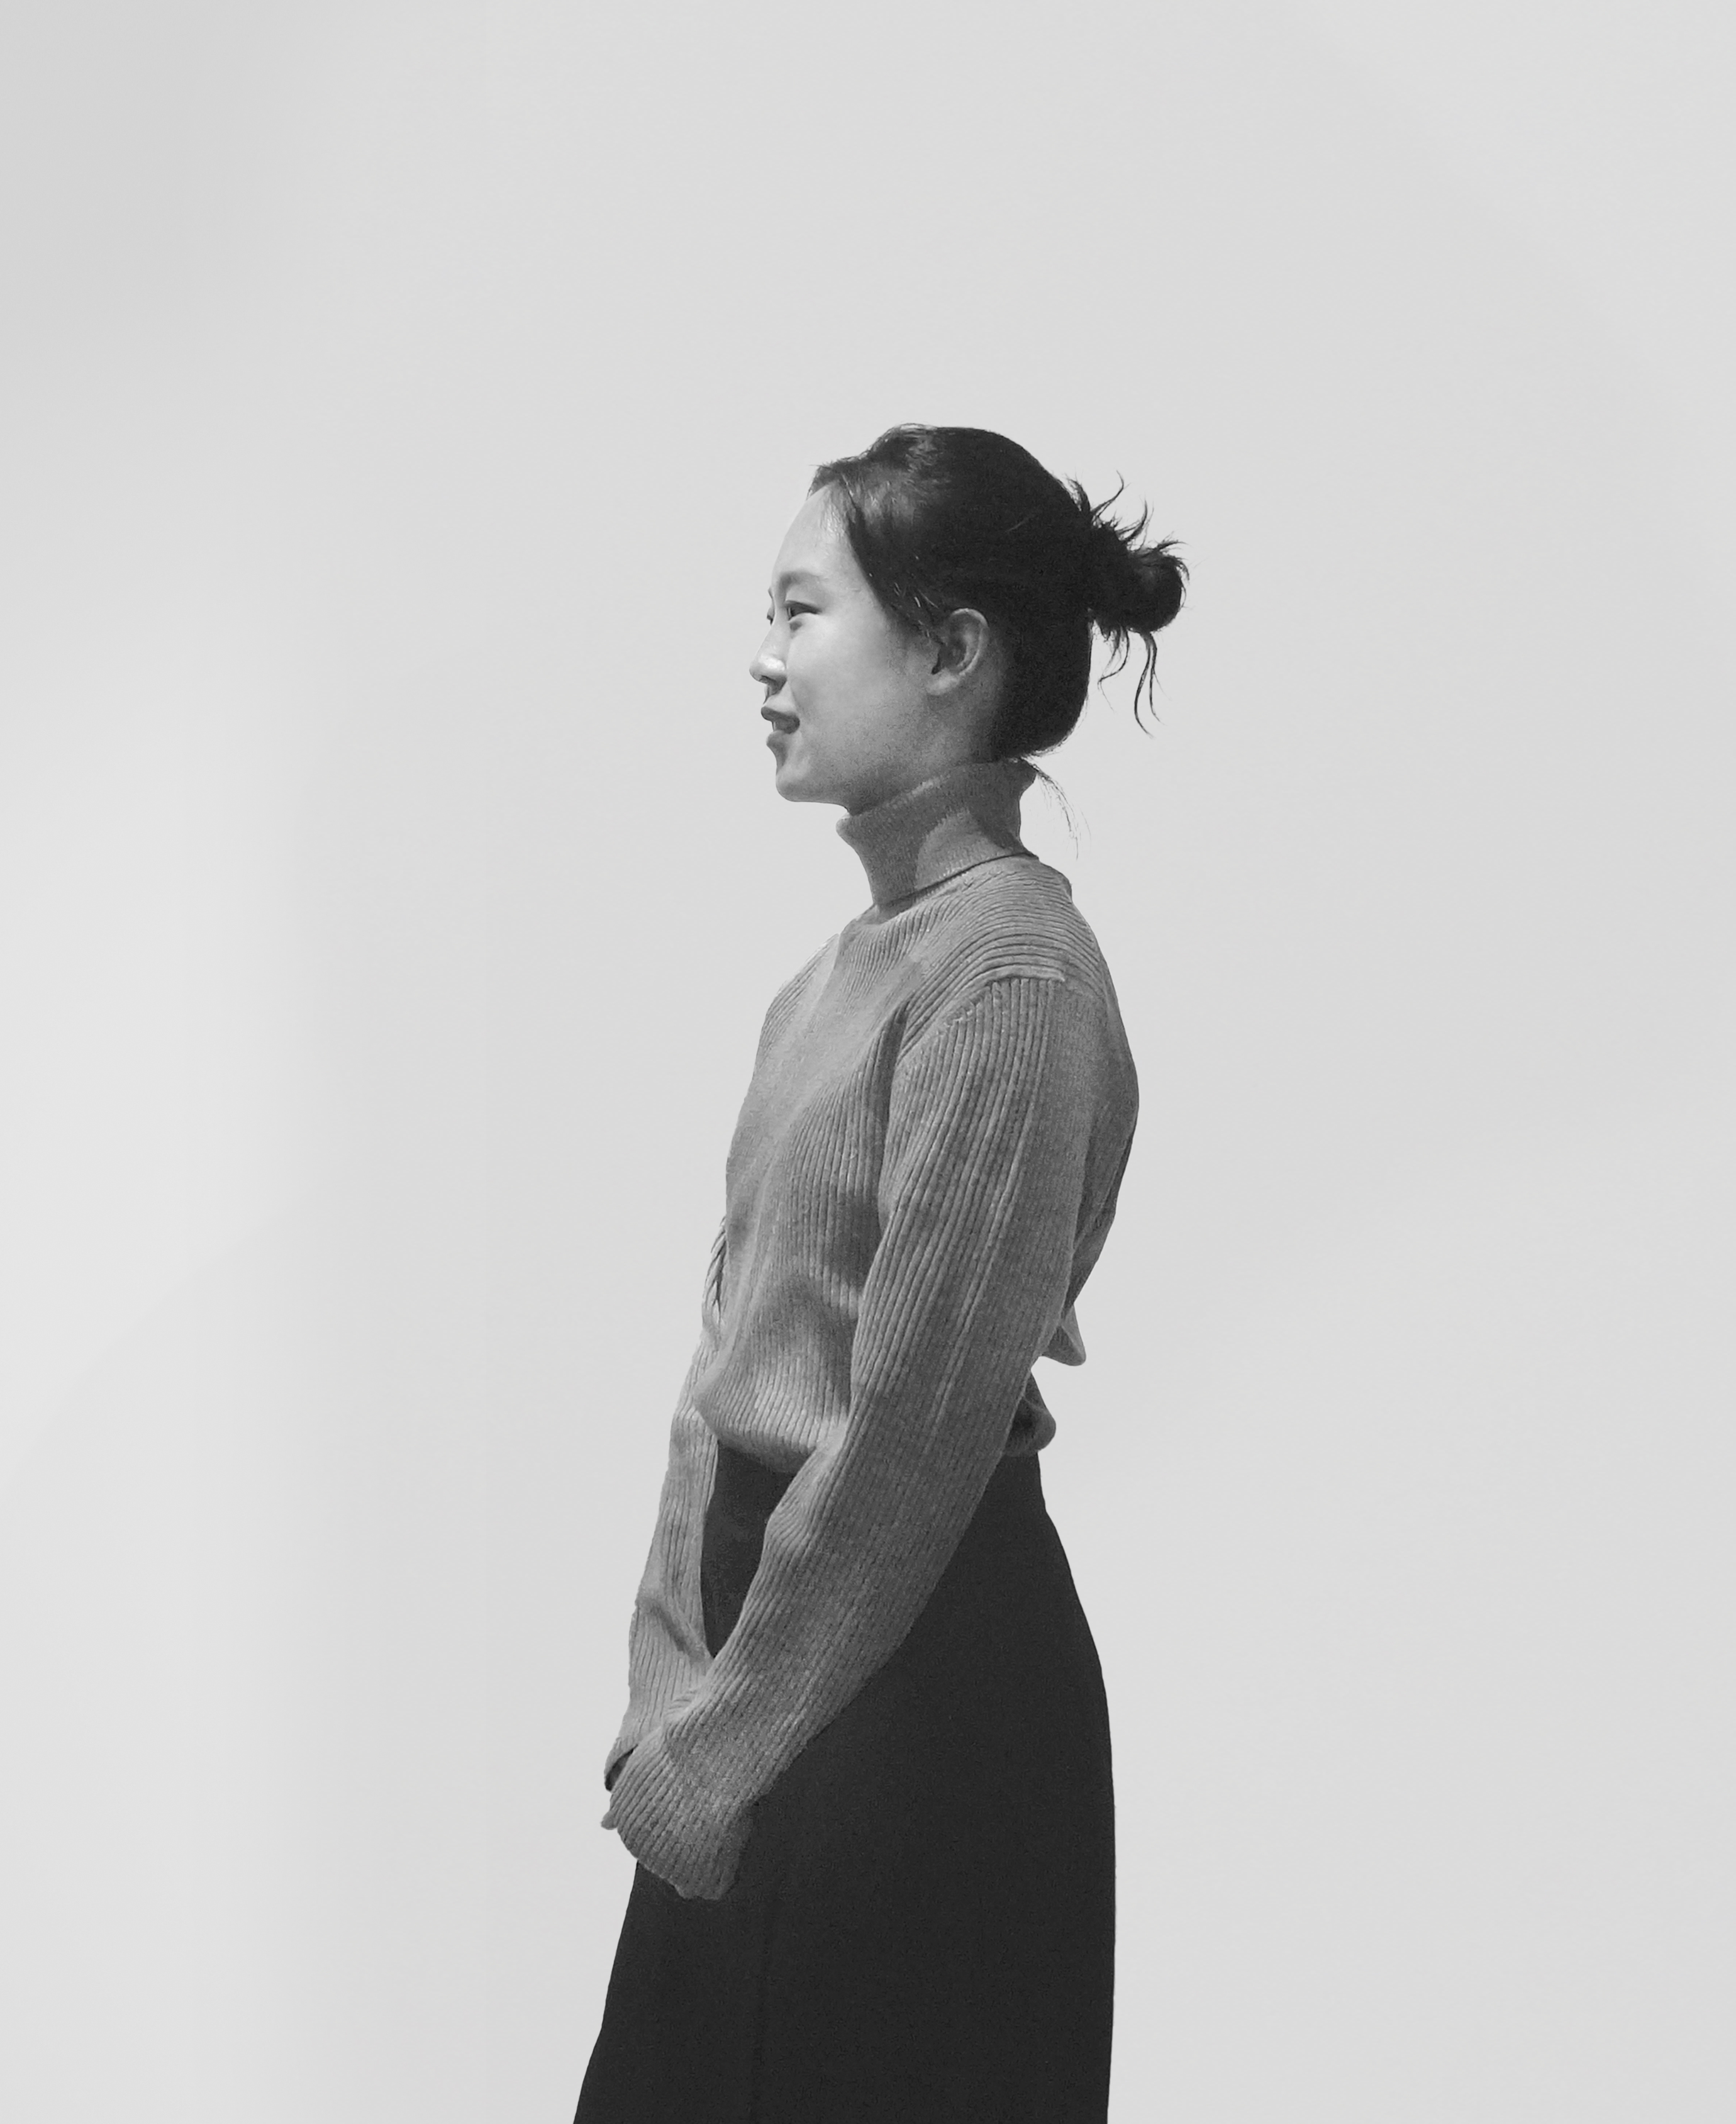 Heewon Kwon